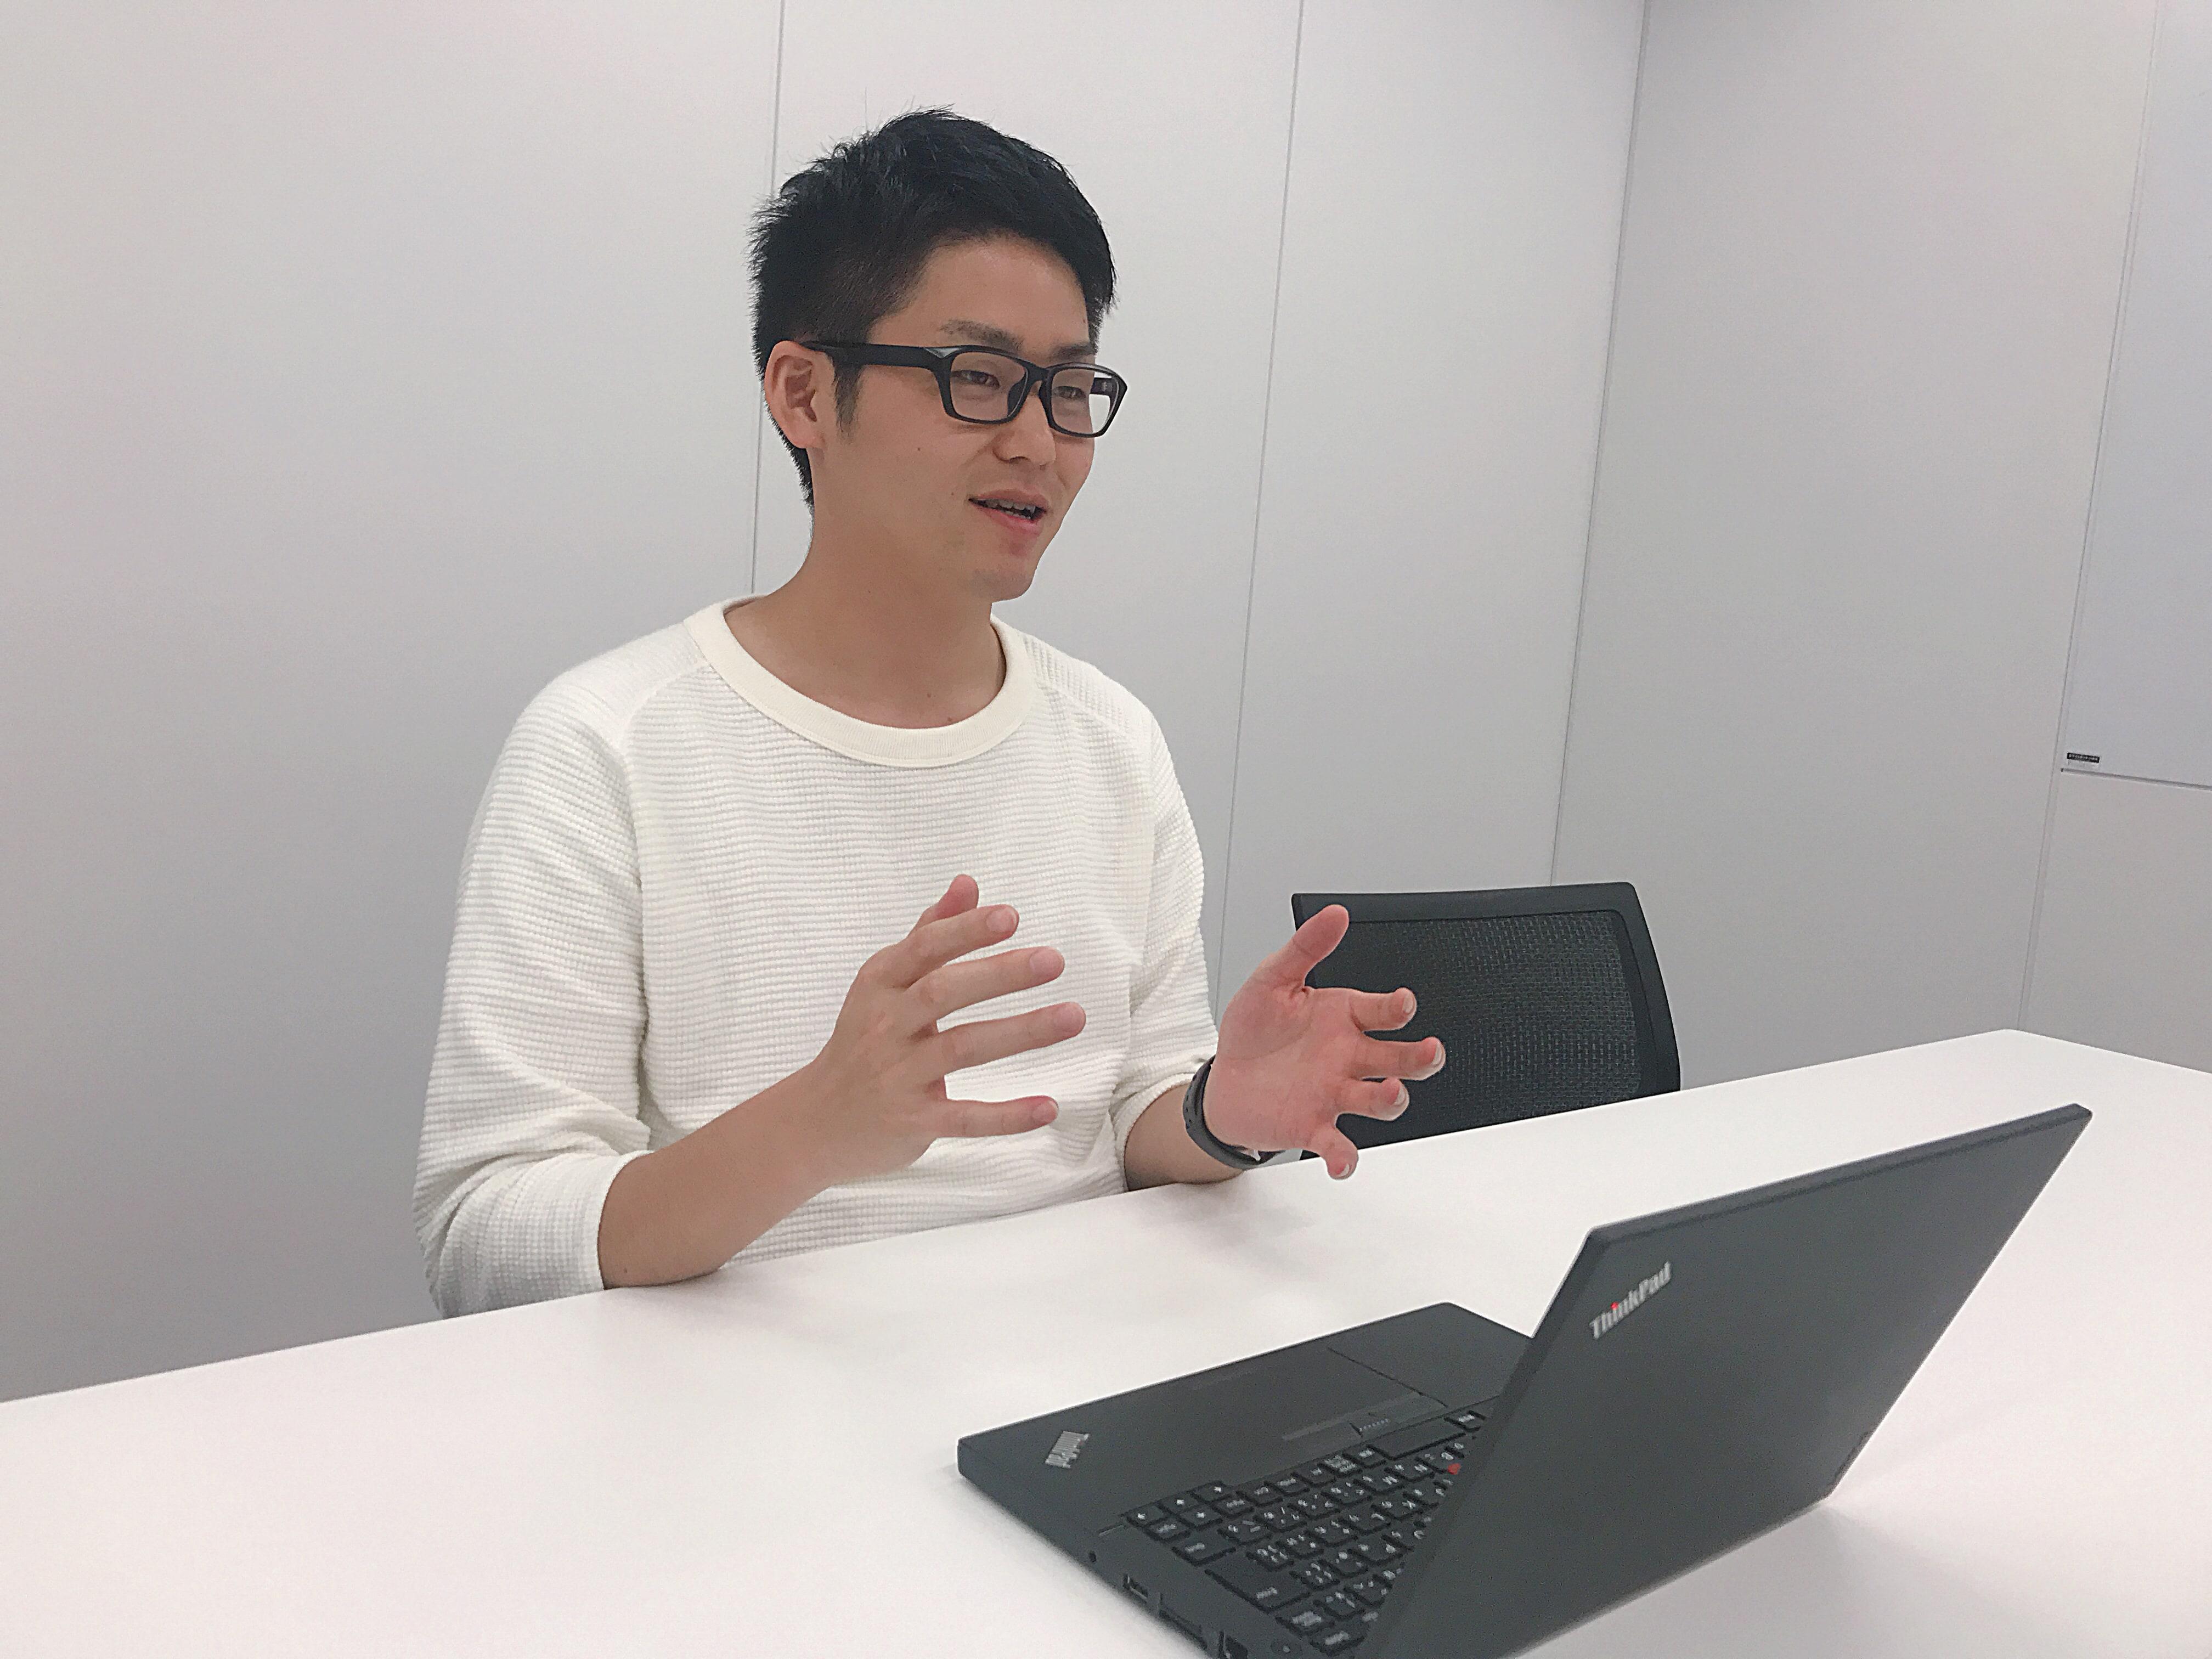 Stock(ストック)インタビュー諸橋貴彦様写真